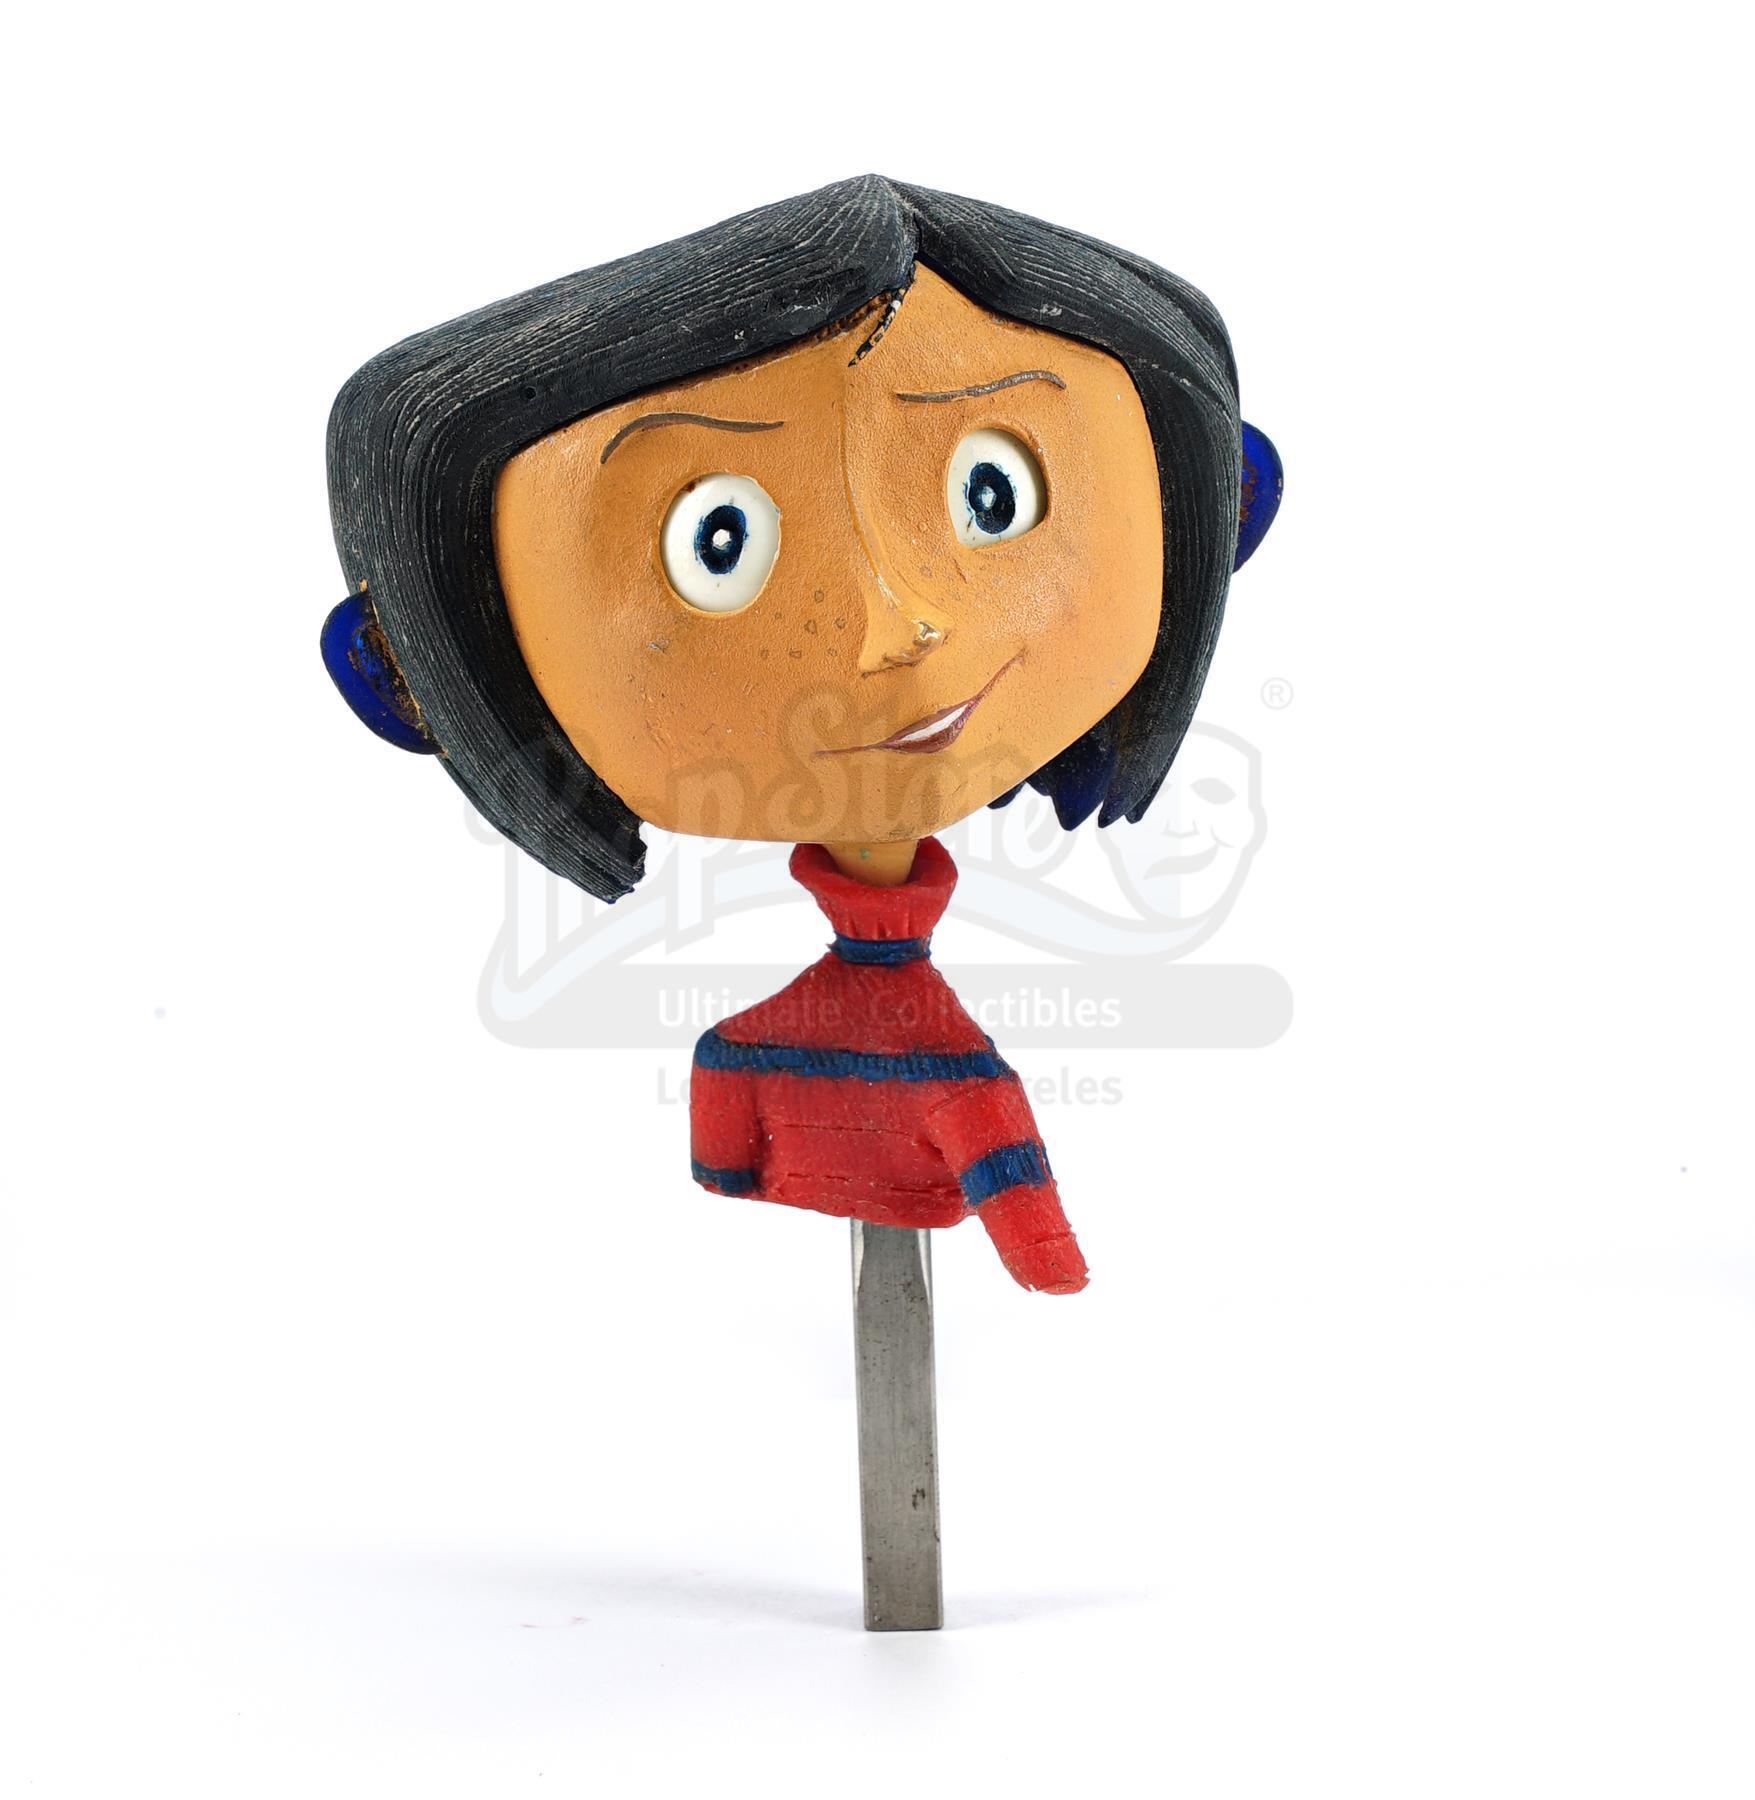 Lot # 54: CORALINE - First-Ever Prototype Coraline Jones (Dakota Fanning) Puppet Built for the Film